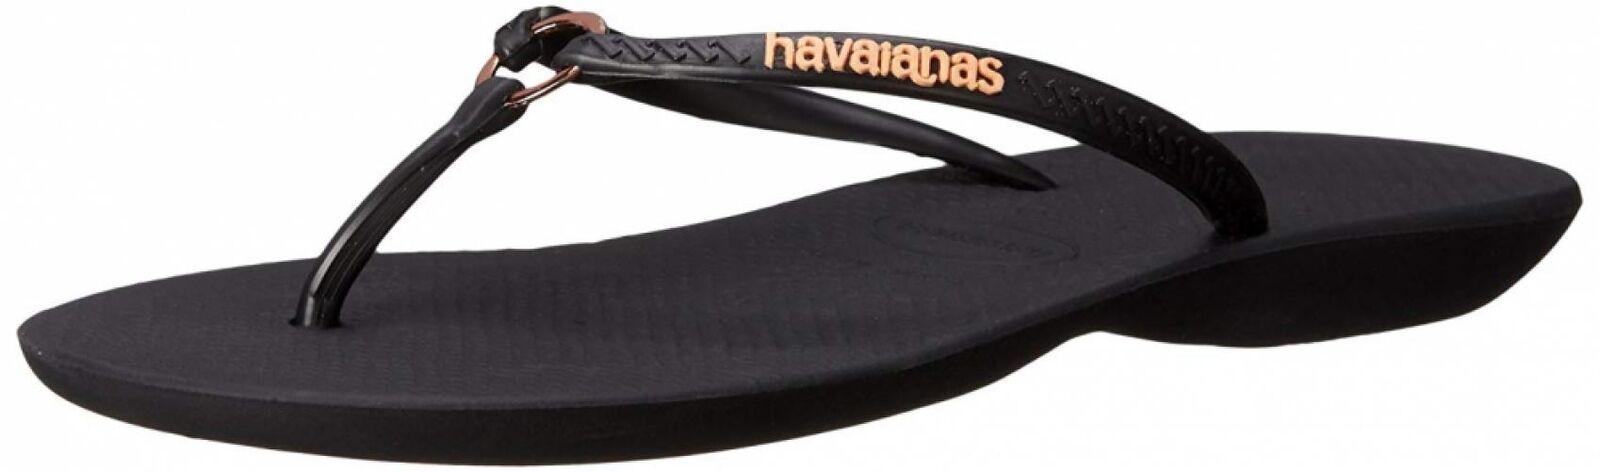 Havaianas Havaianas Havaianas Women's Flip Flop Sandals, Ring bfc66b